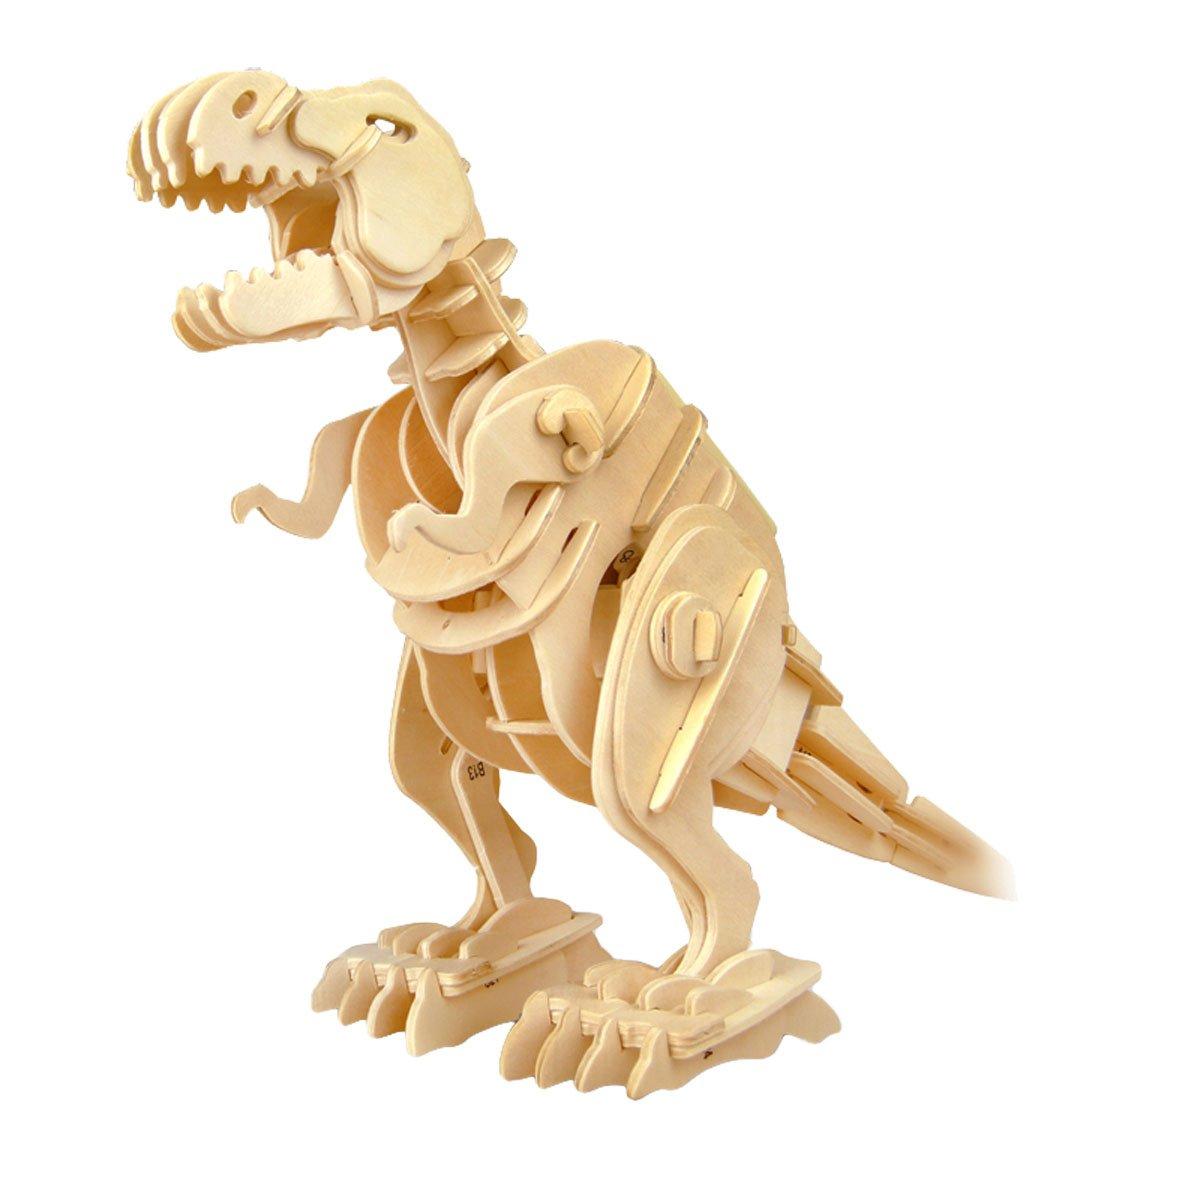 DINOROID T-Rex Walking & Roaring Wooden Dinosaur